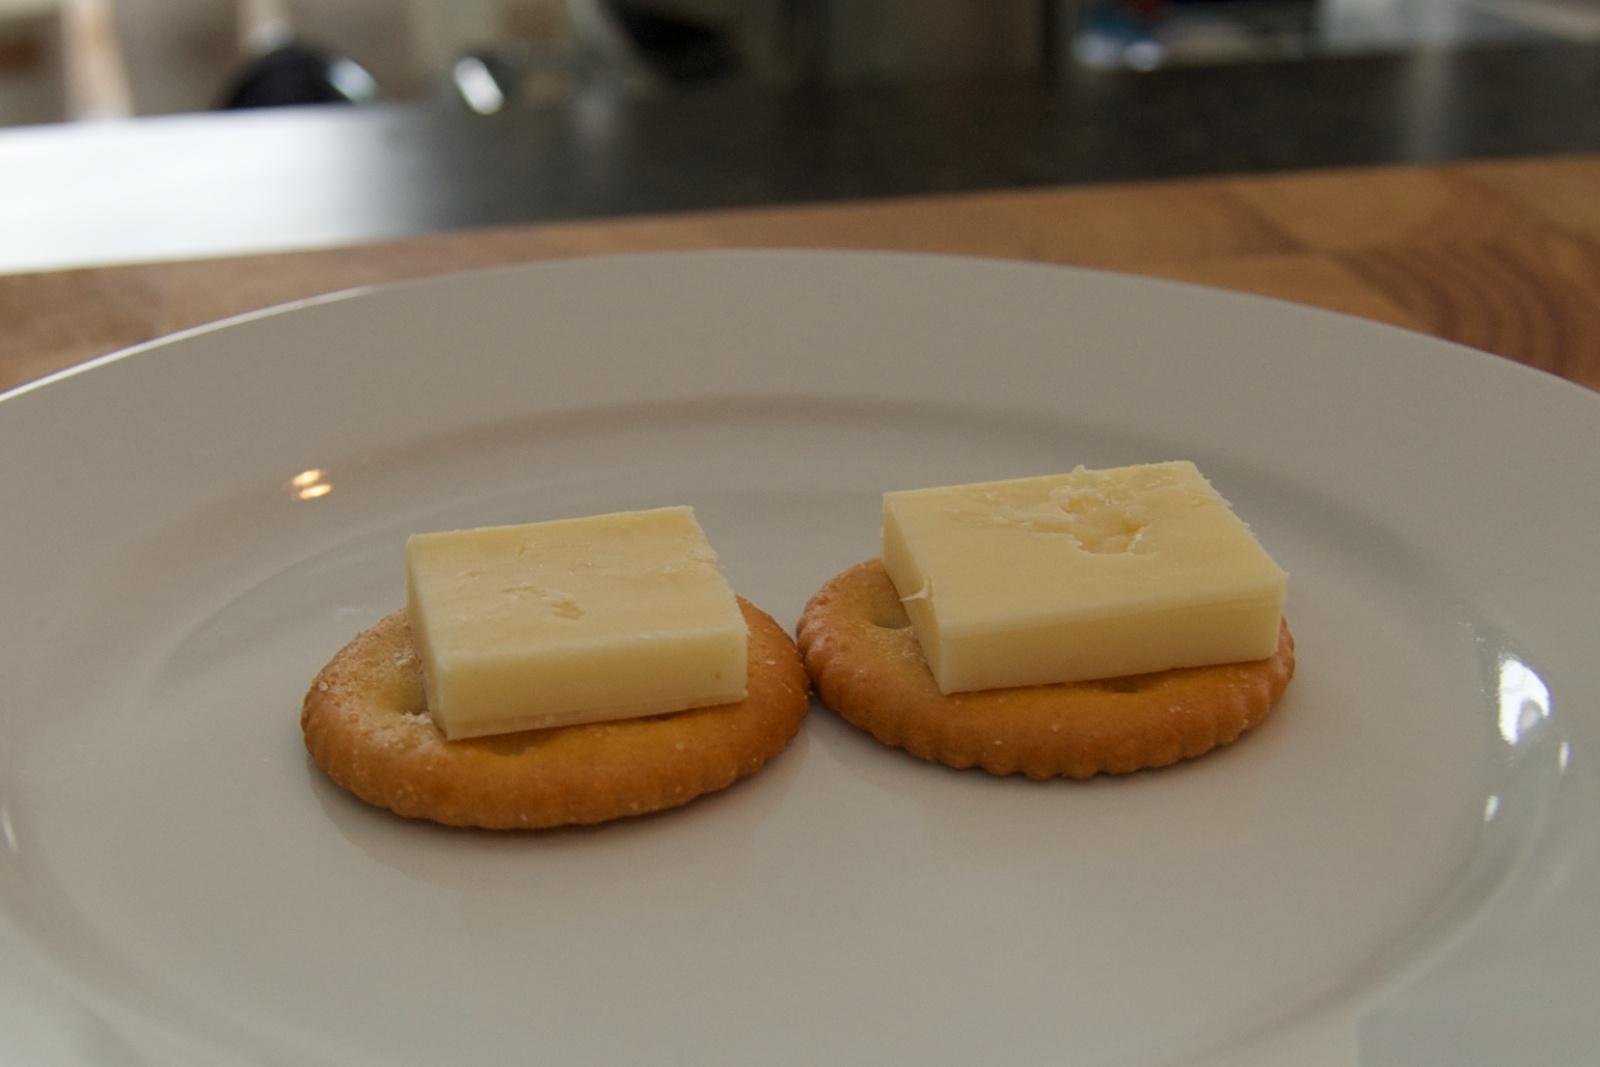 http://blog.rickk.com/food/2011/04/10/ate.2011.04.10.s.jpg